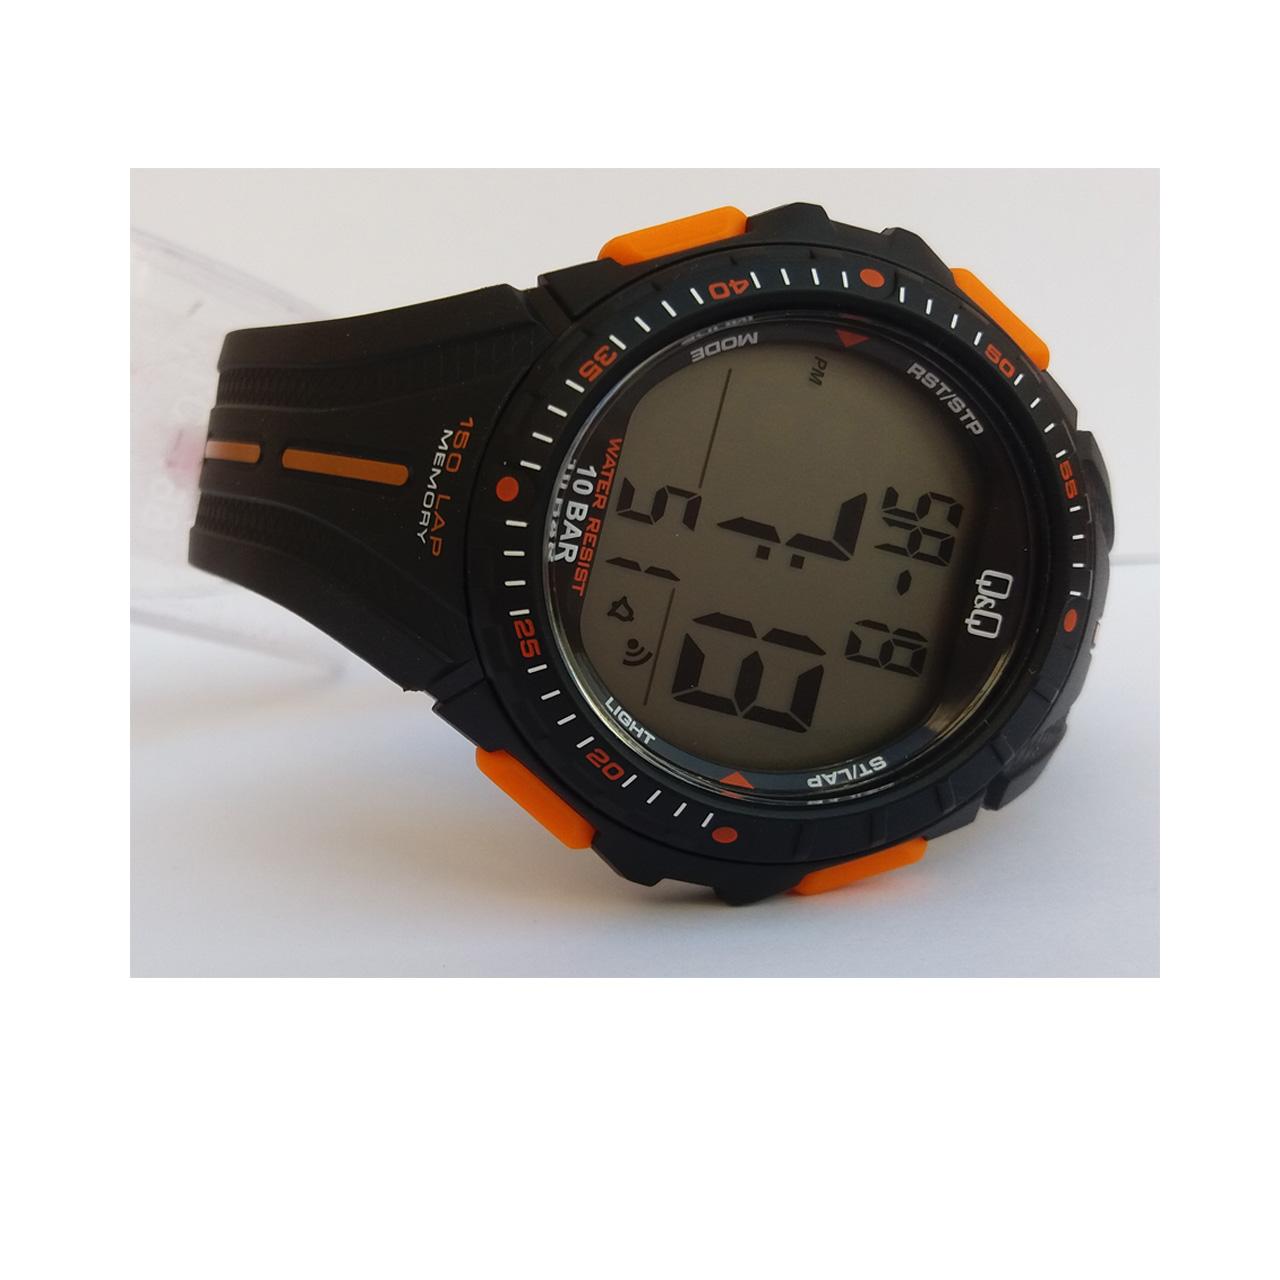 ساعت مچی دیجیتال مردانه کیو اند کیو مدل M102J002Y             قیمت